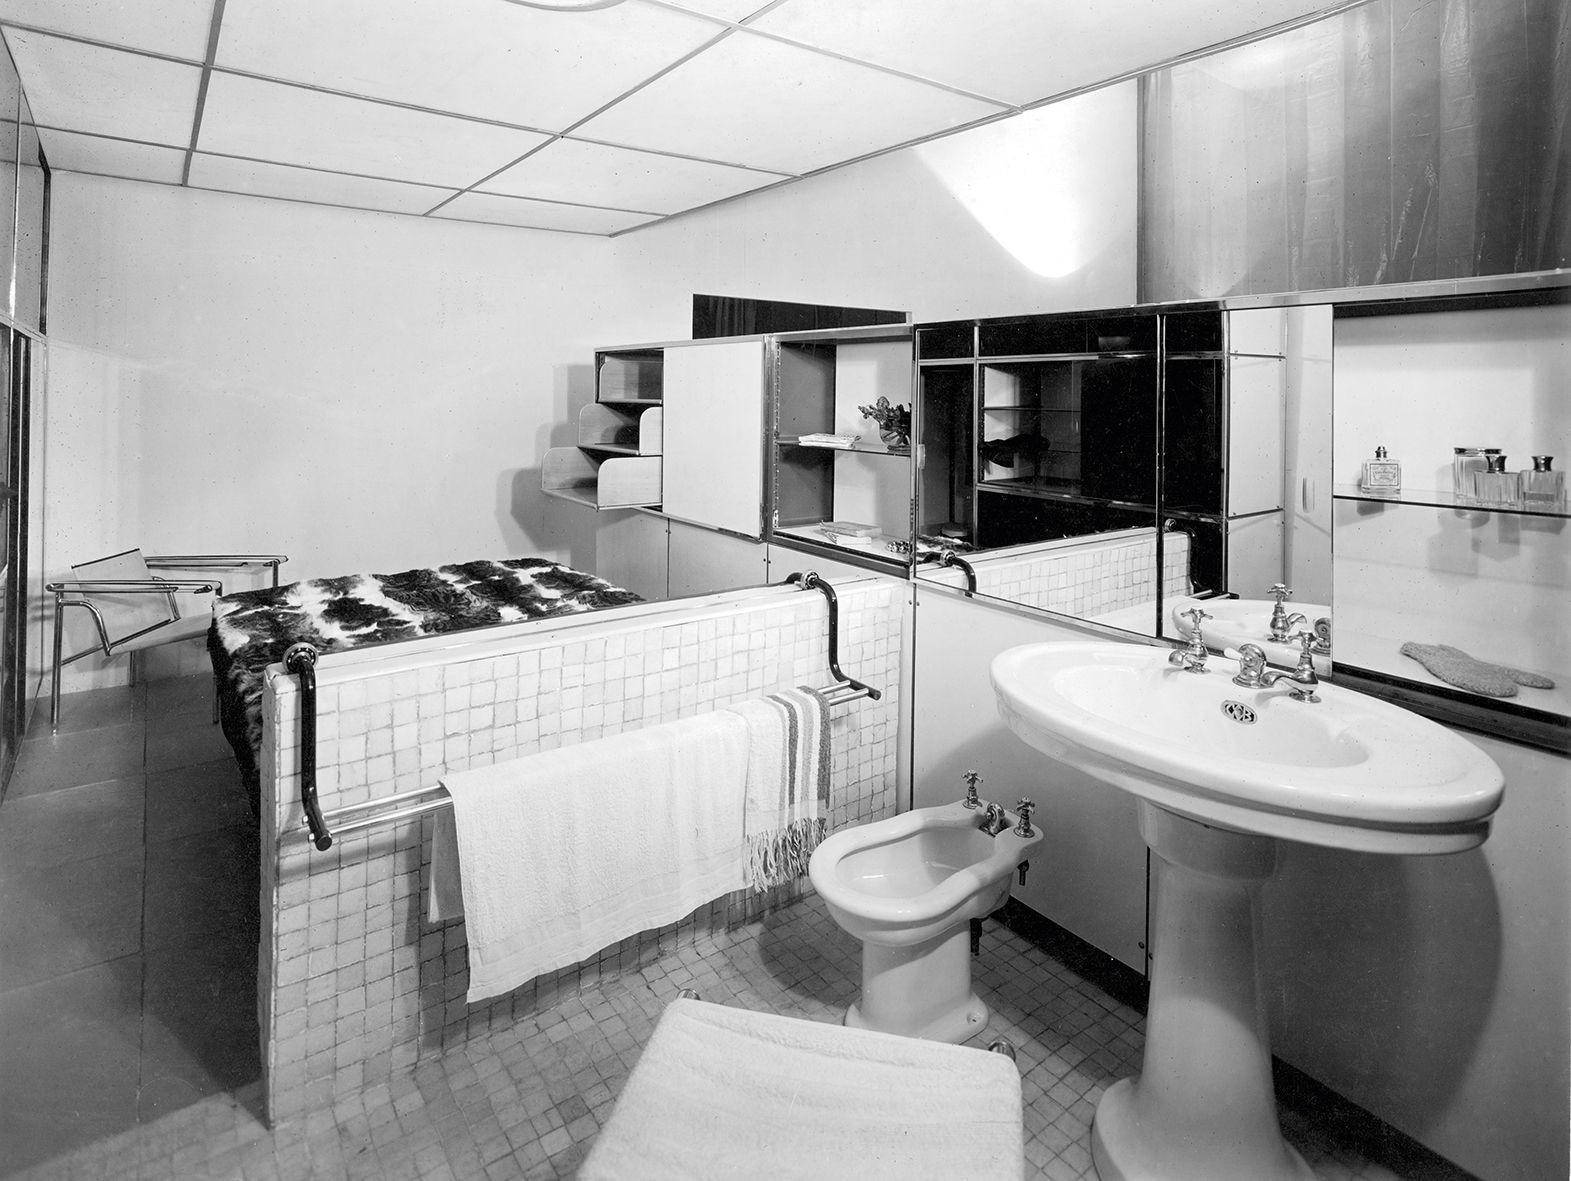 Furniture interiors by le corbusier colorfully loud - Le corbusier design ...